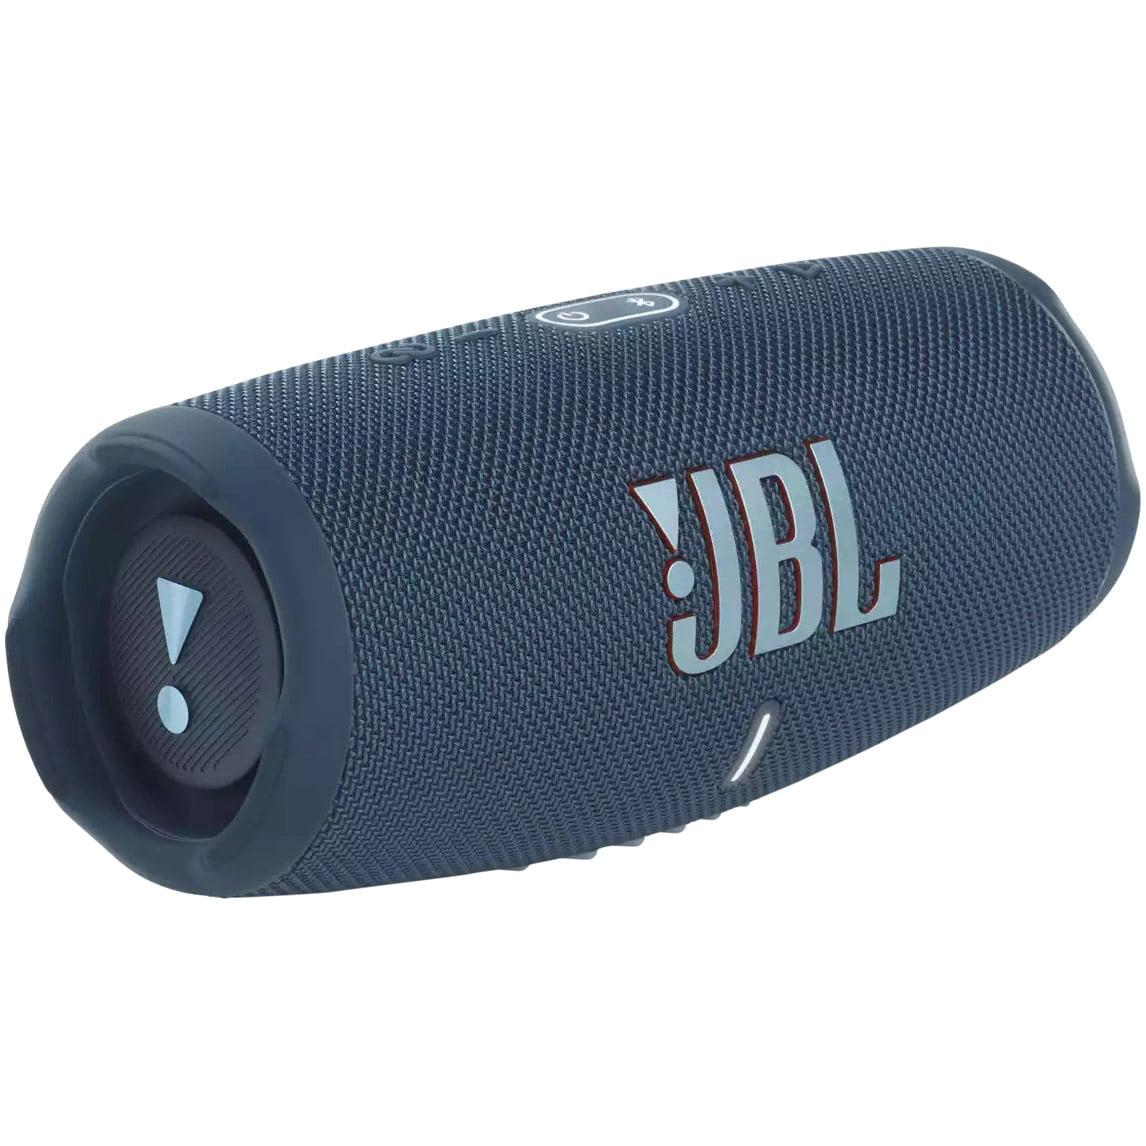 Boxa portabila JBL Charge 5, Wireless, Bluetooth, PartyBoost, Powerbank 7500mAh, IP67, Blue